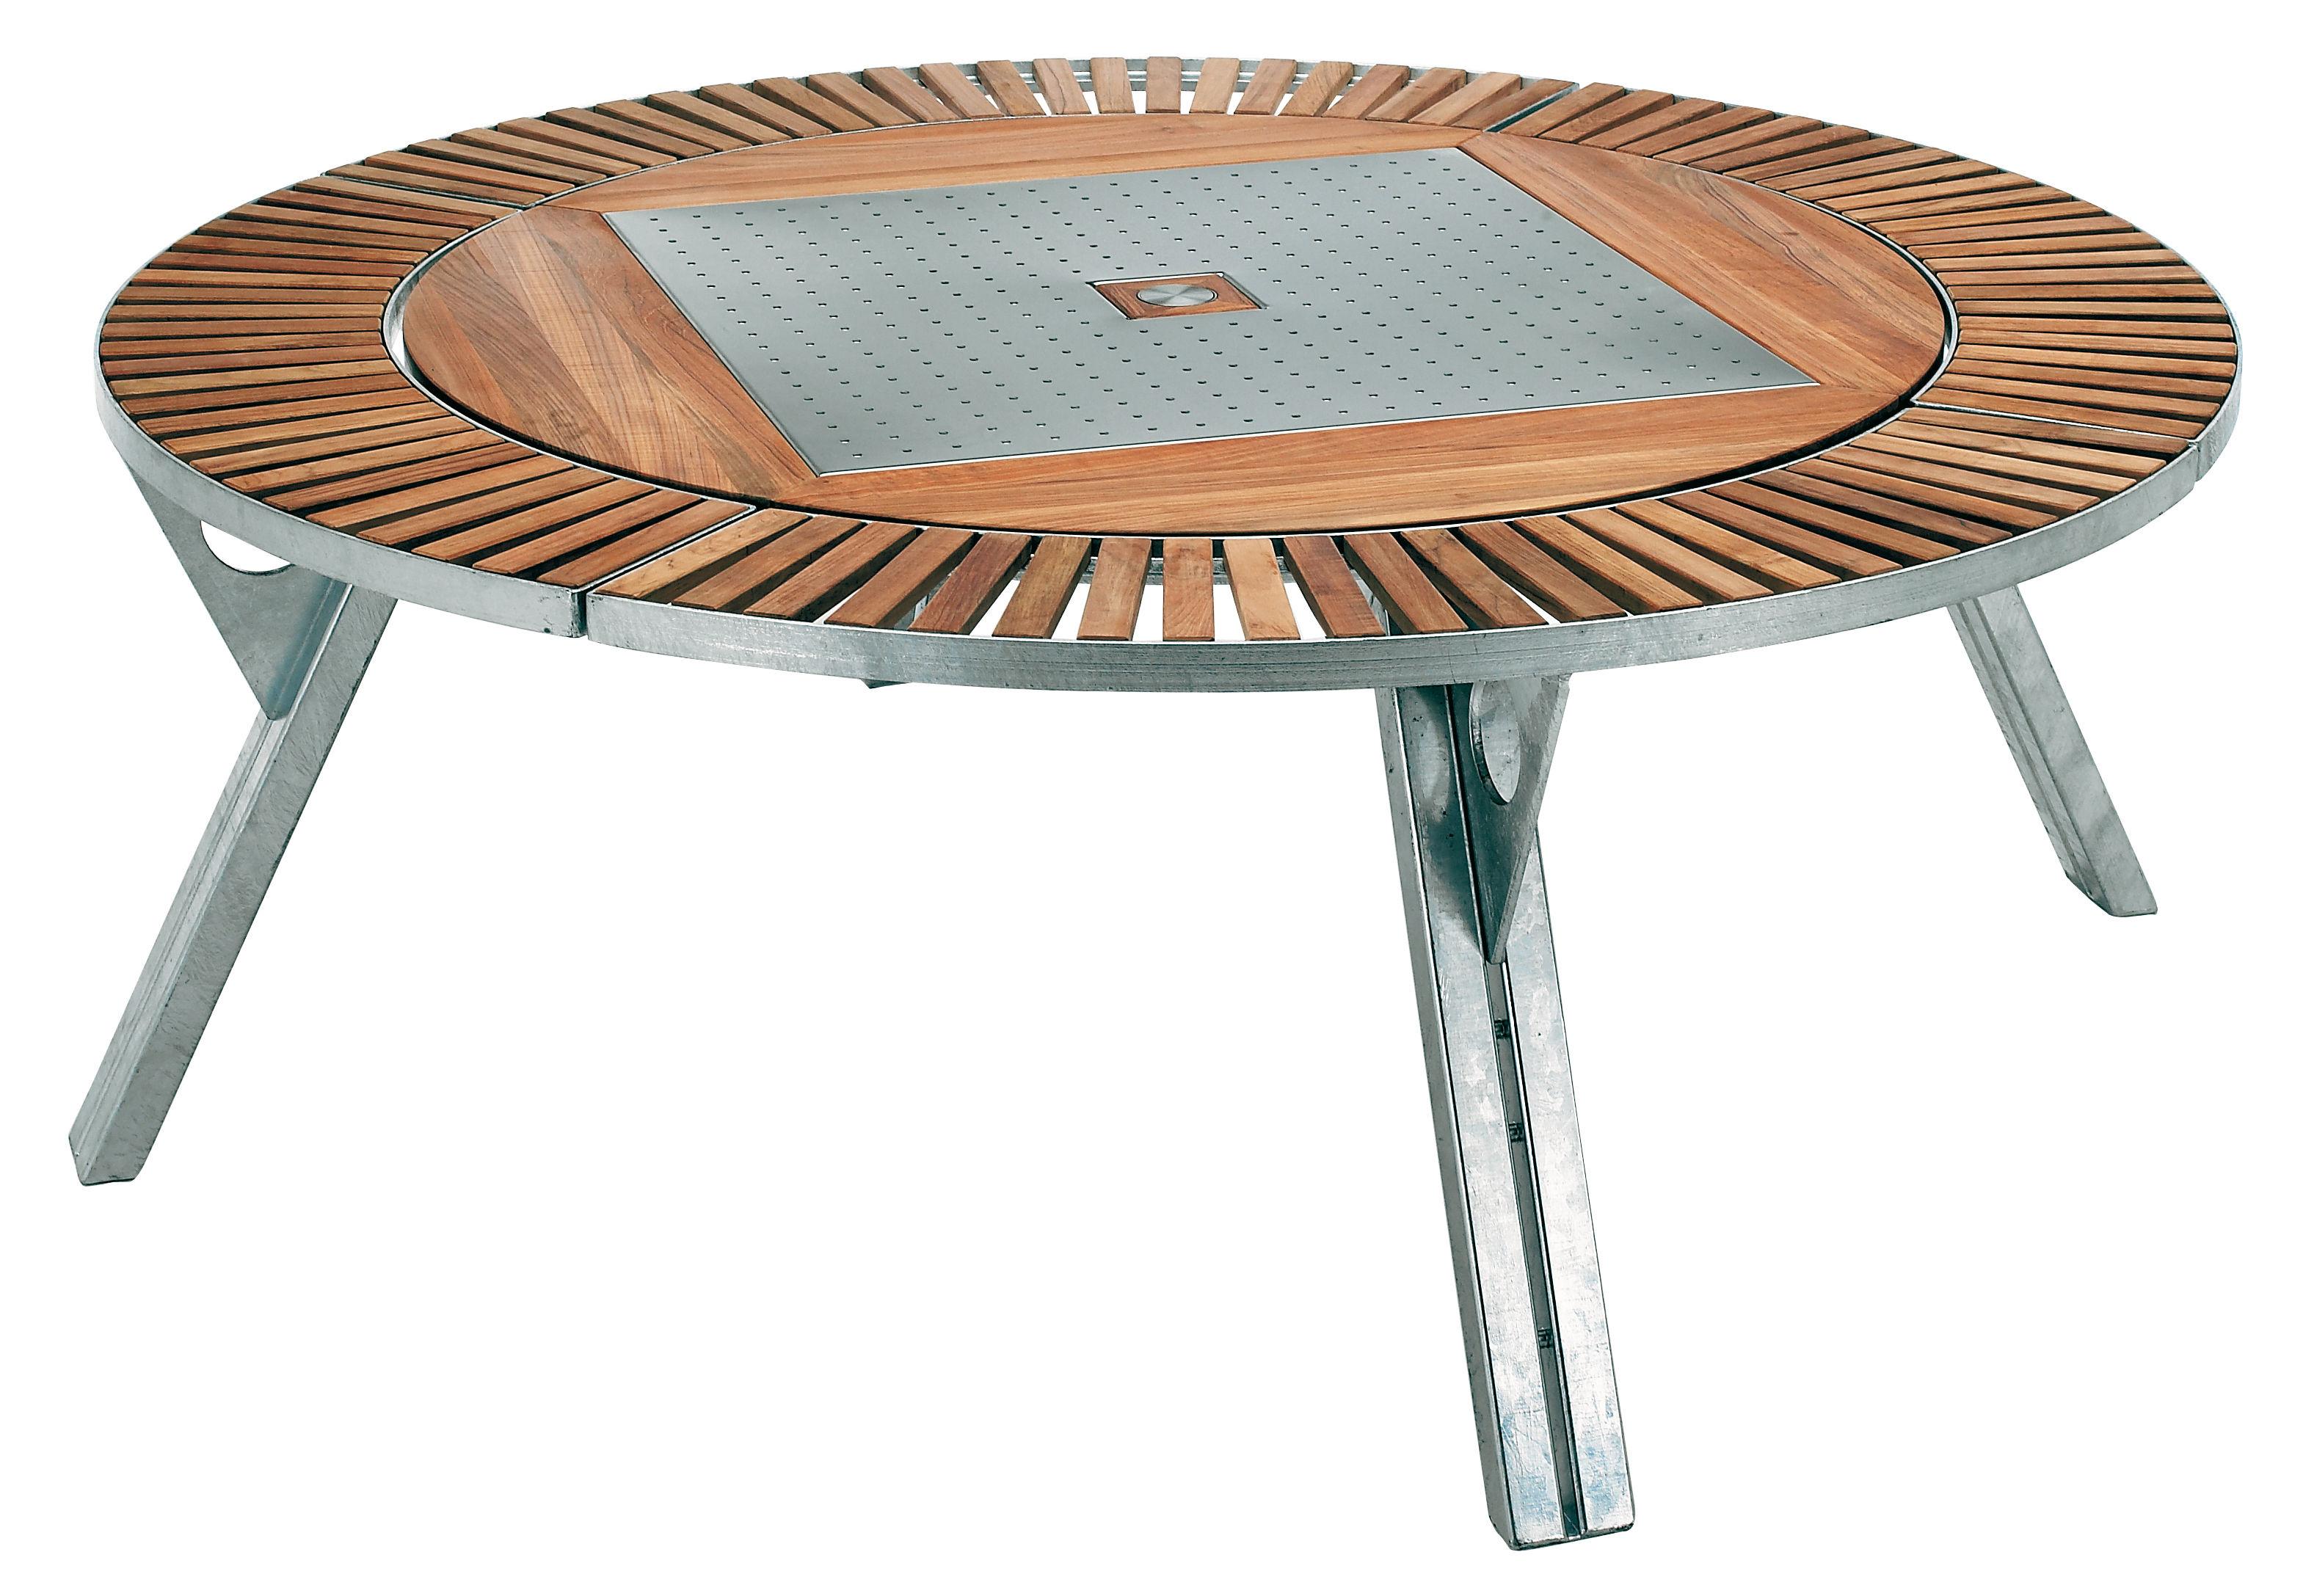 Table de jardin gargantua 146 cm 200 cm banc - Table jardin hauteur reglable toulouse ...